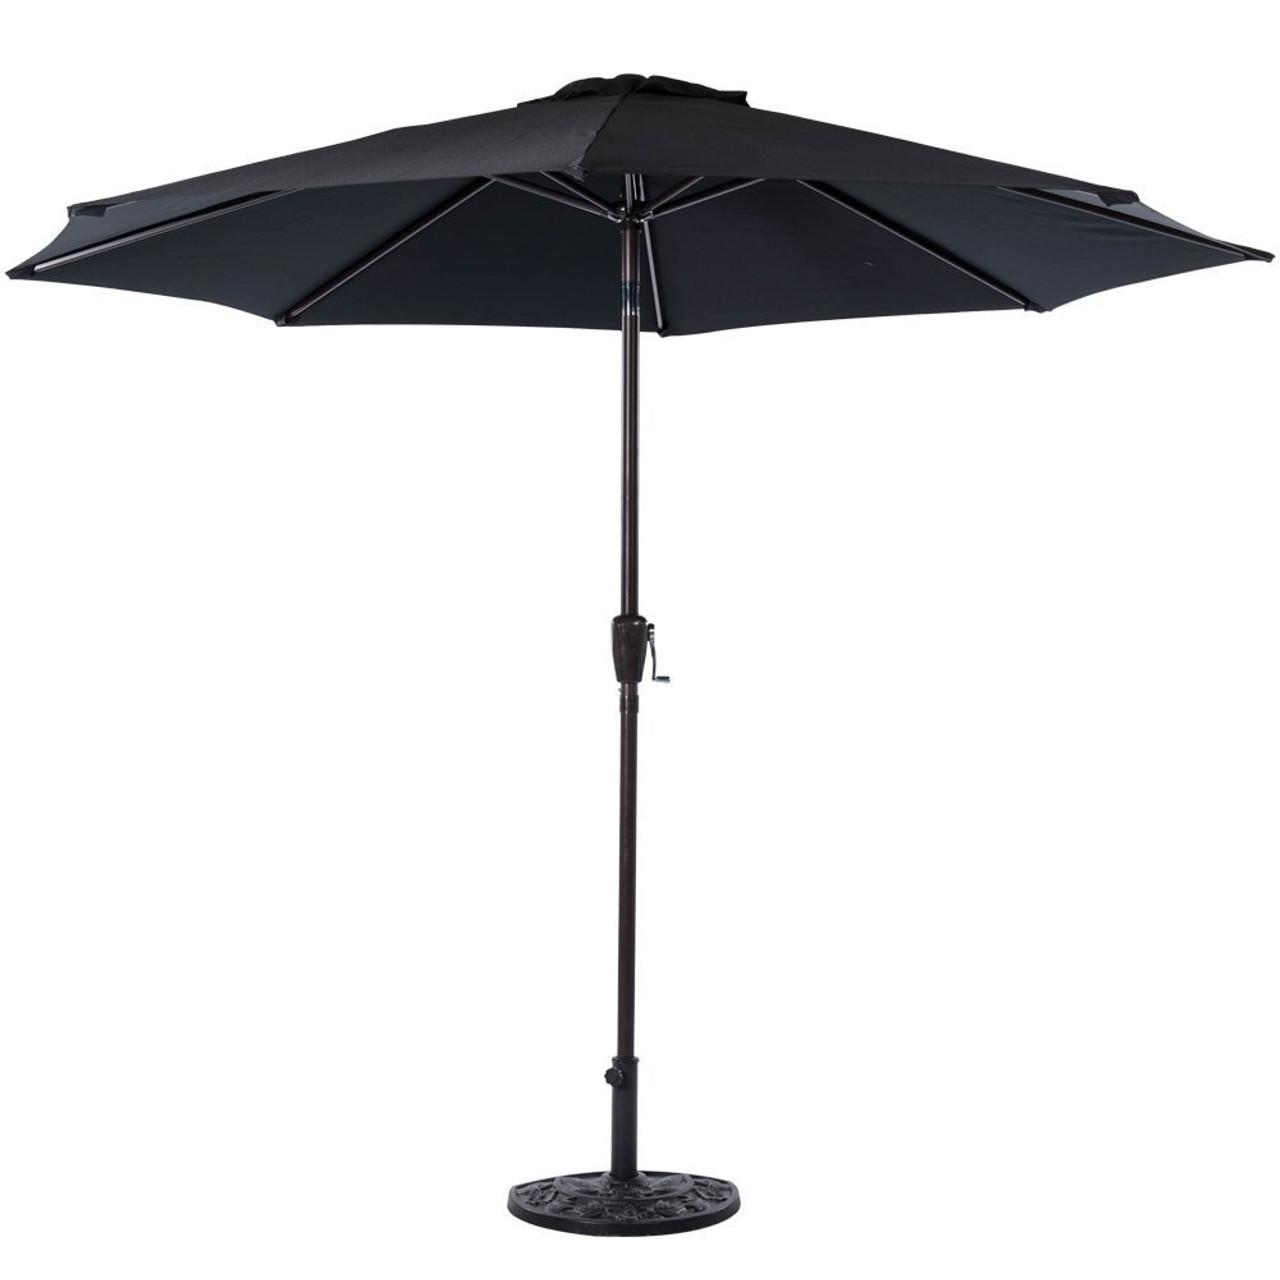 Charmant 10 Feet Outdoor Aluminum Patio Umbrella(Black)